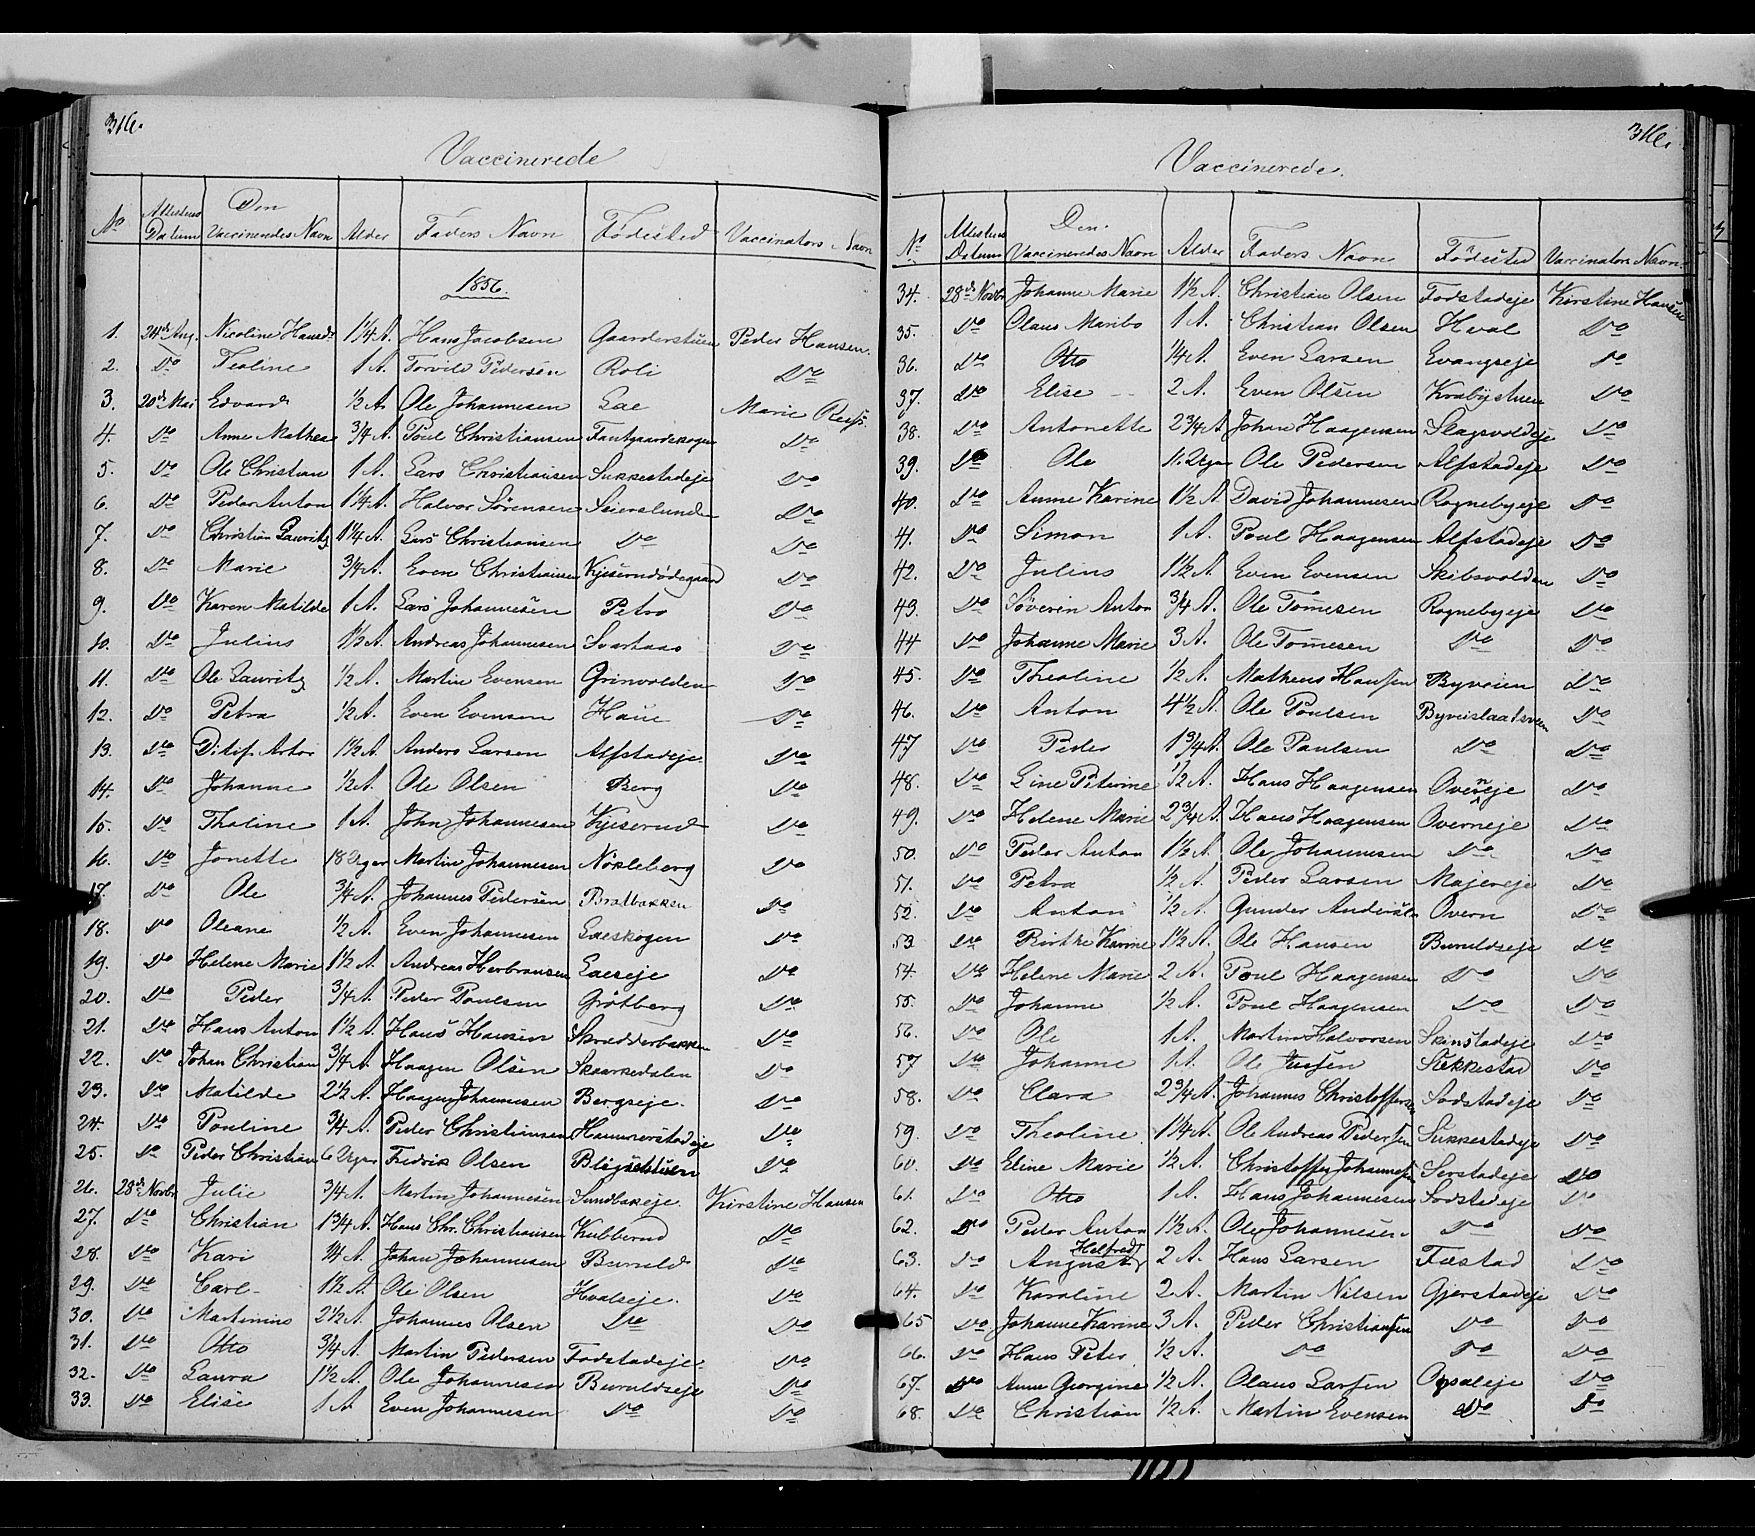 SAH, Østre Toten prestekontor, Ministerialbok nr. 3, 1848-1856, s. 316